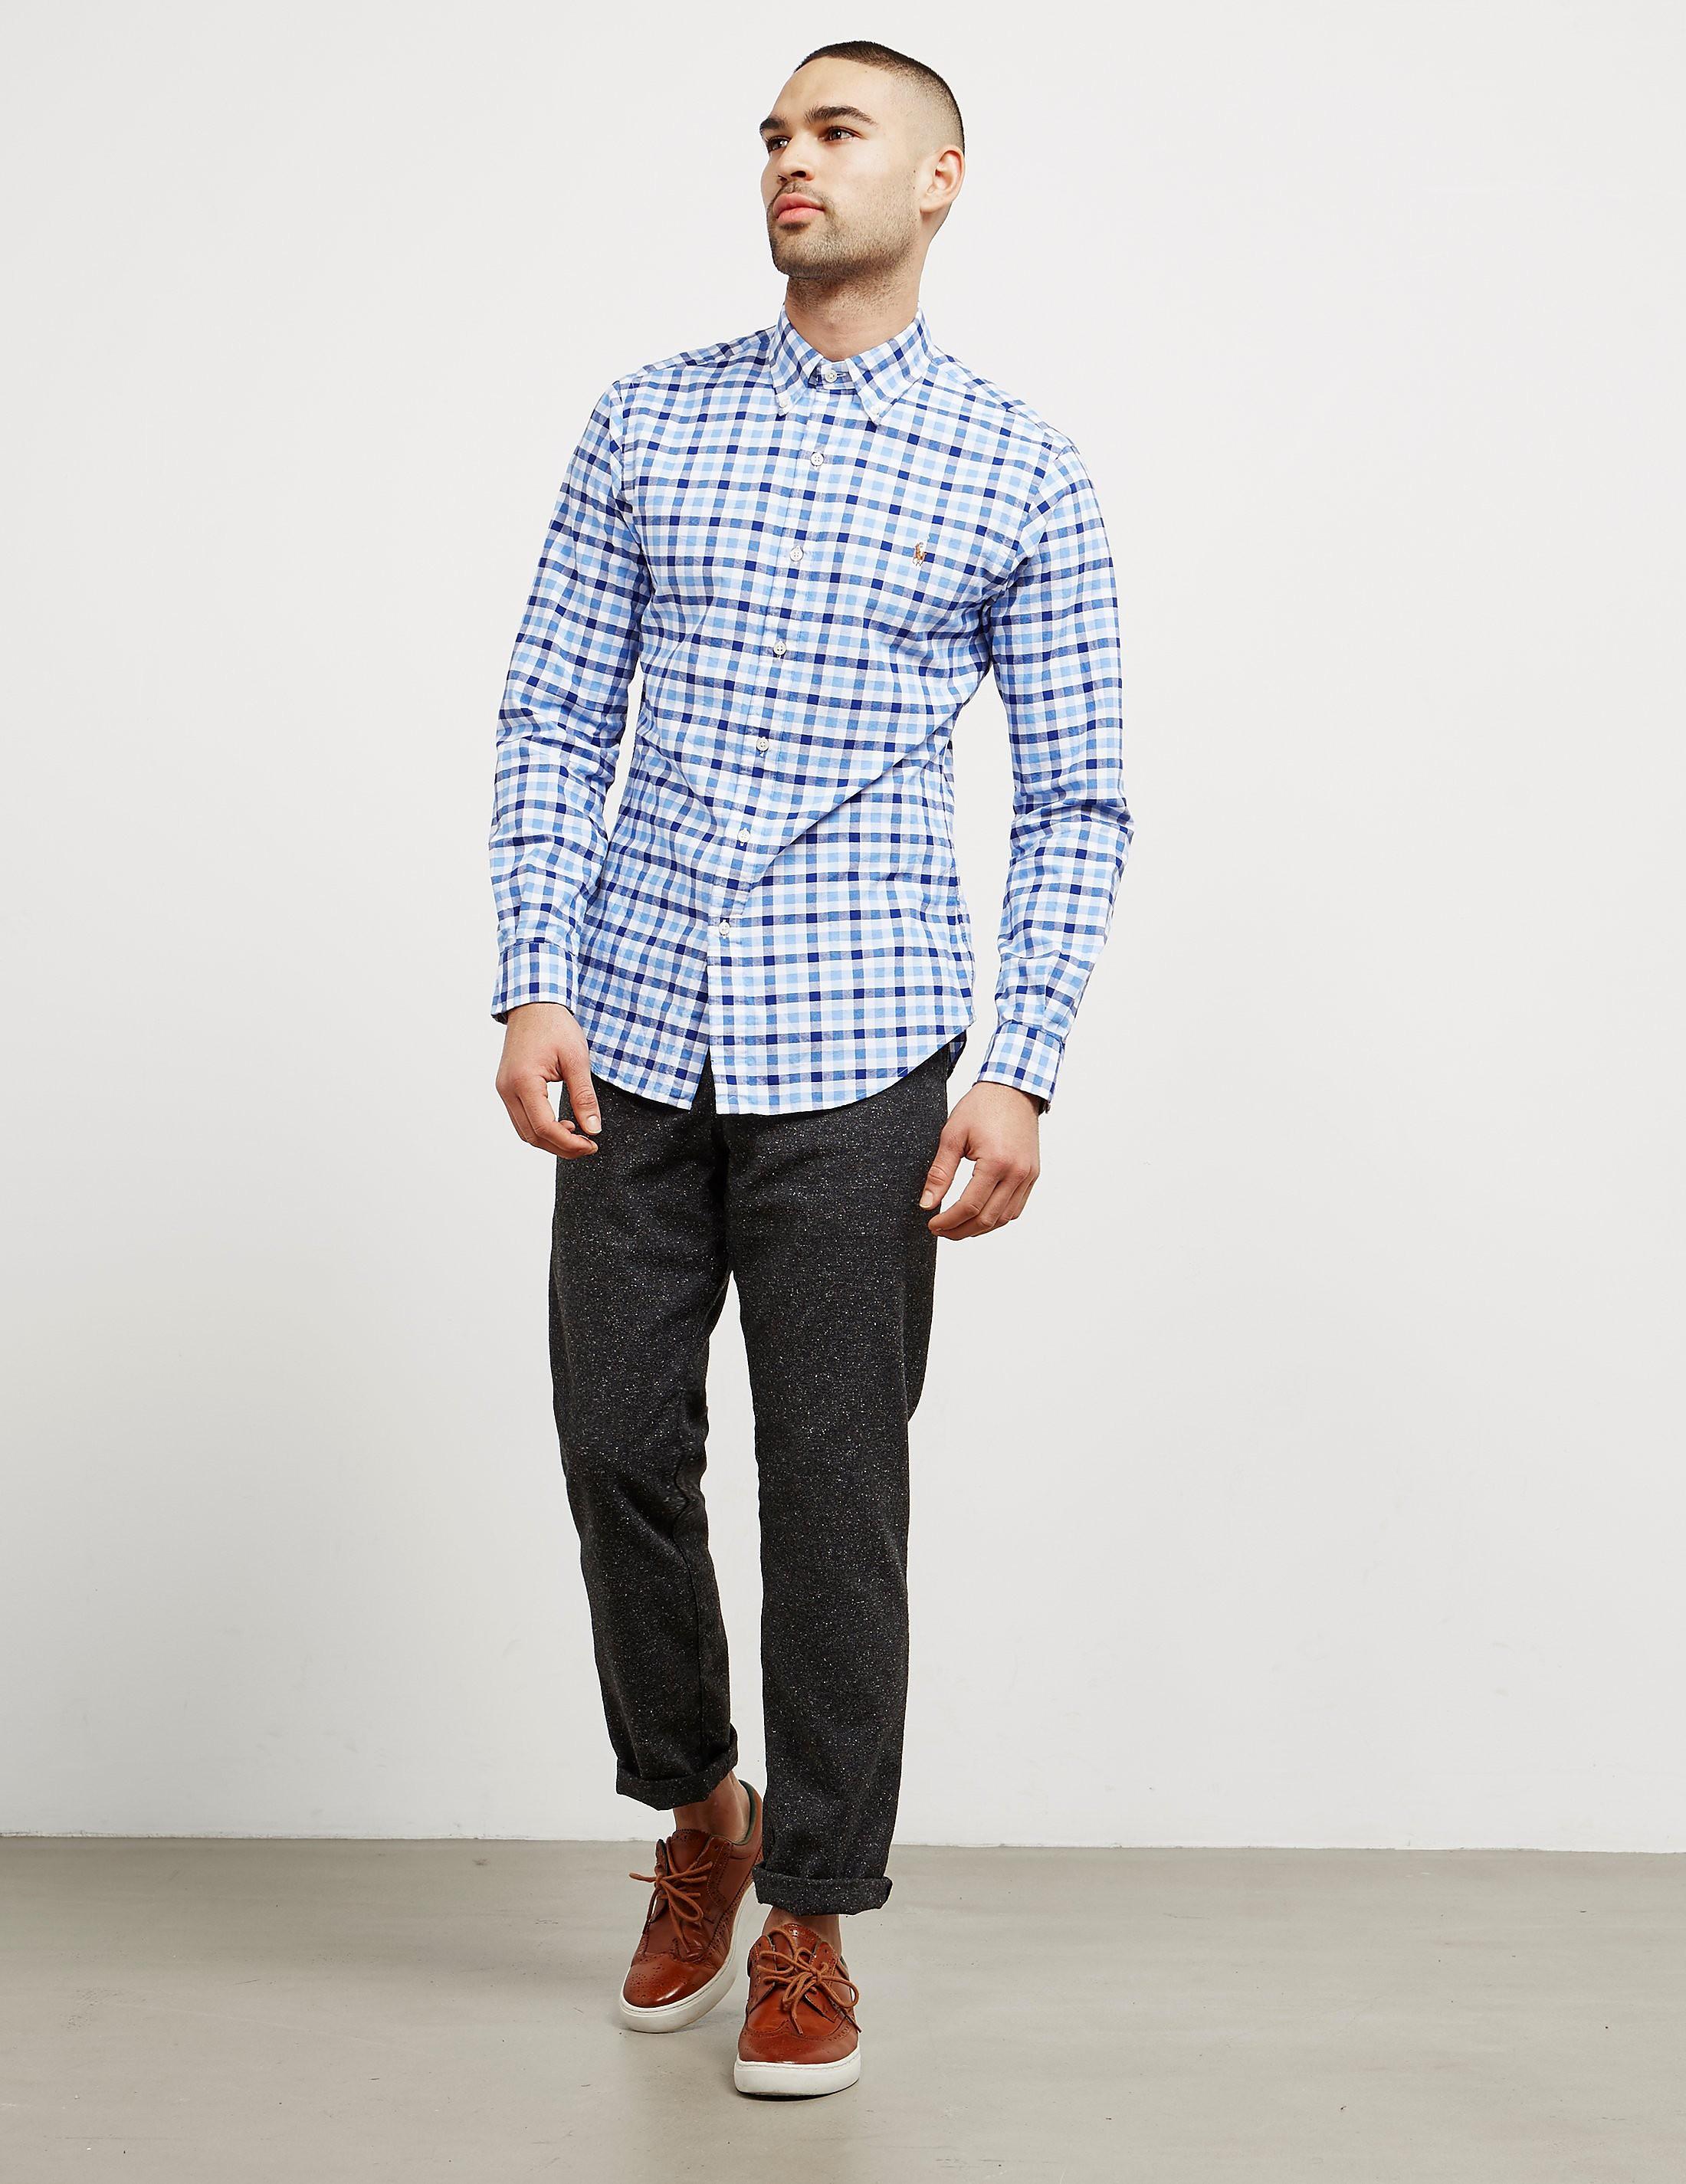 Polo Ralph Lauren Flannel Long Sleeve Shirt - Online Exclusive